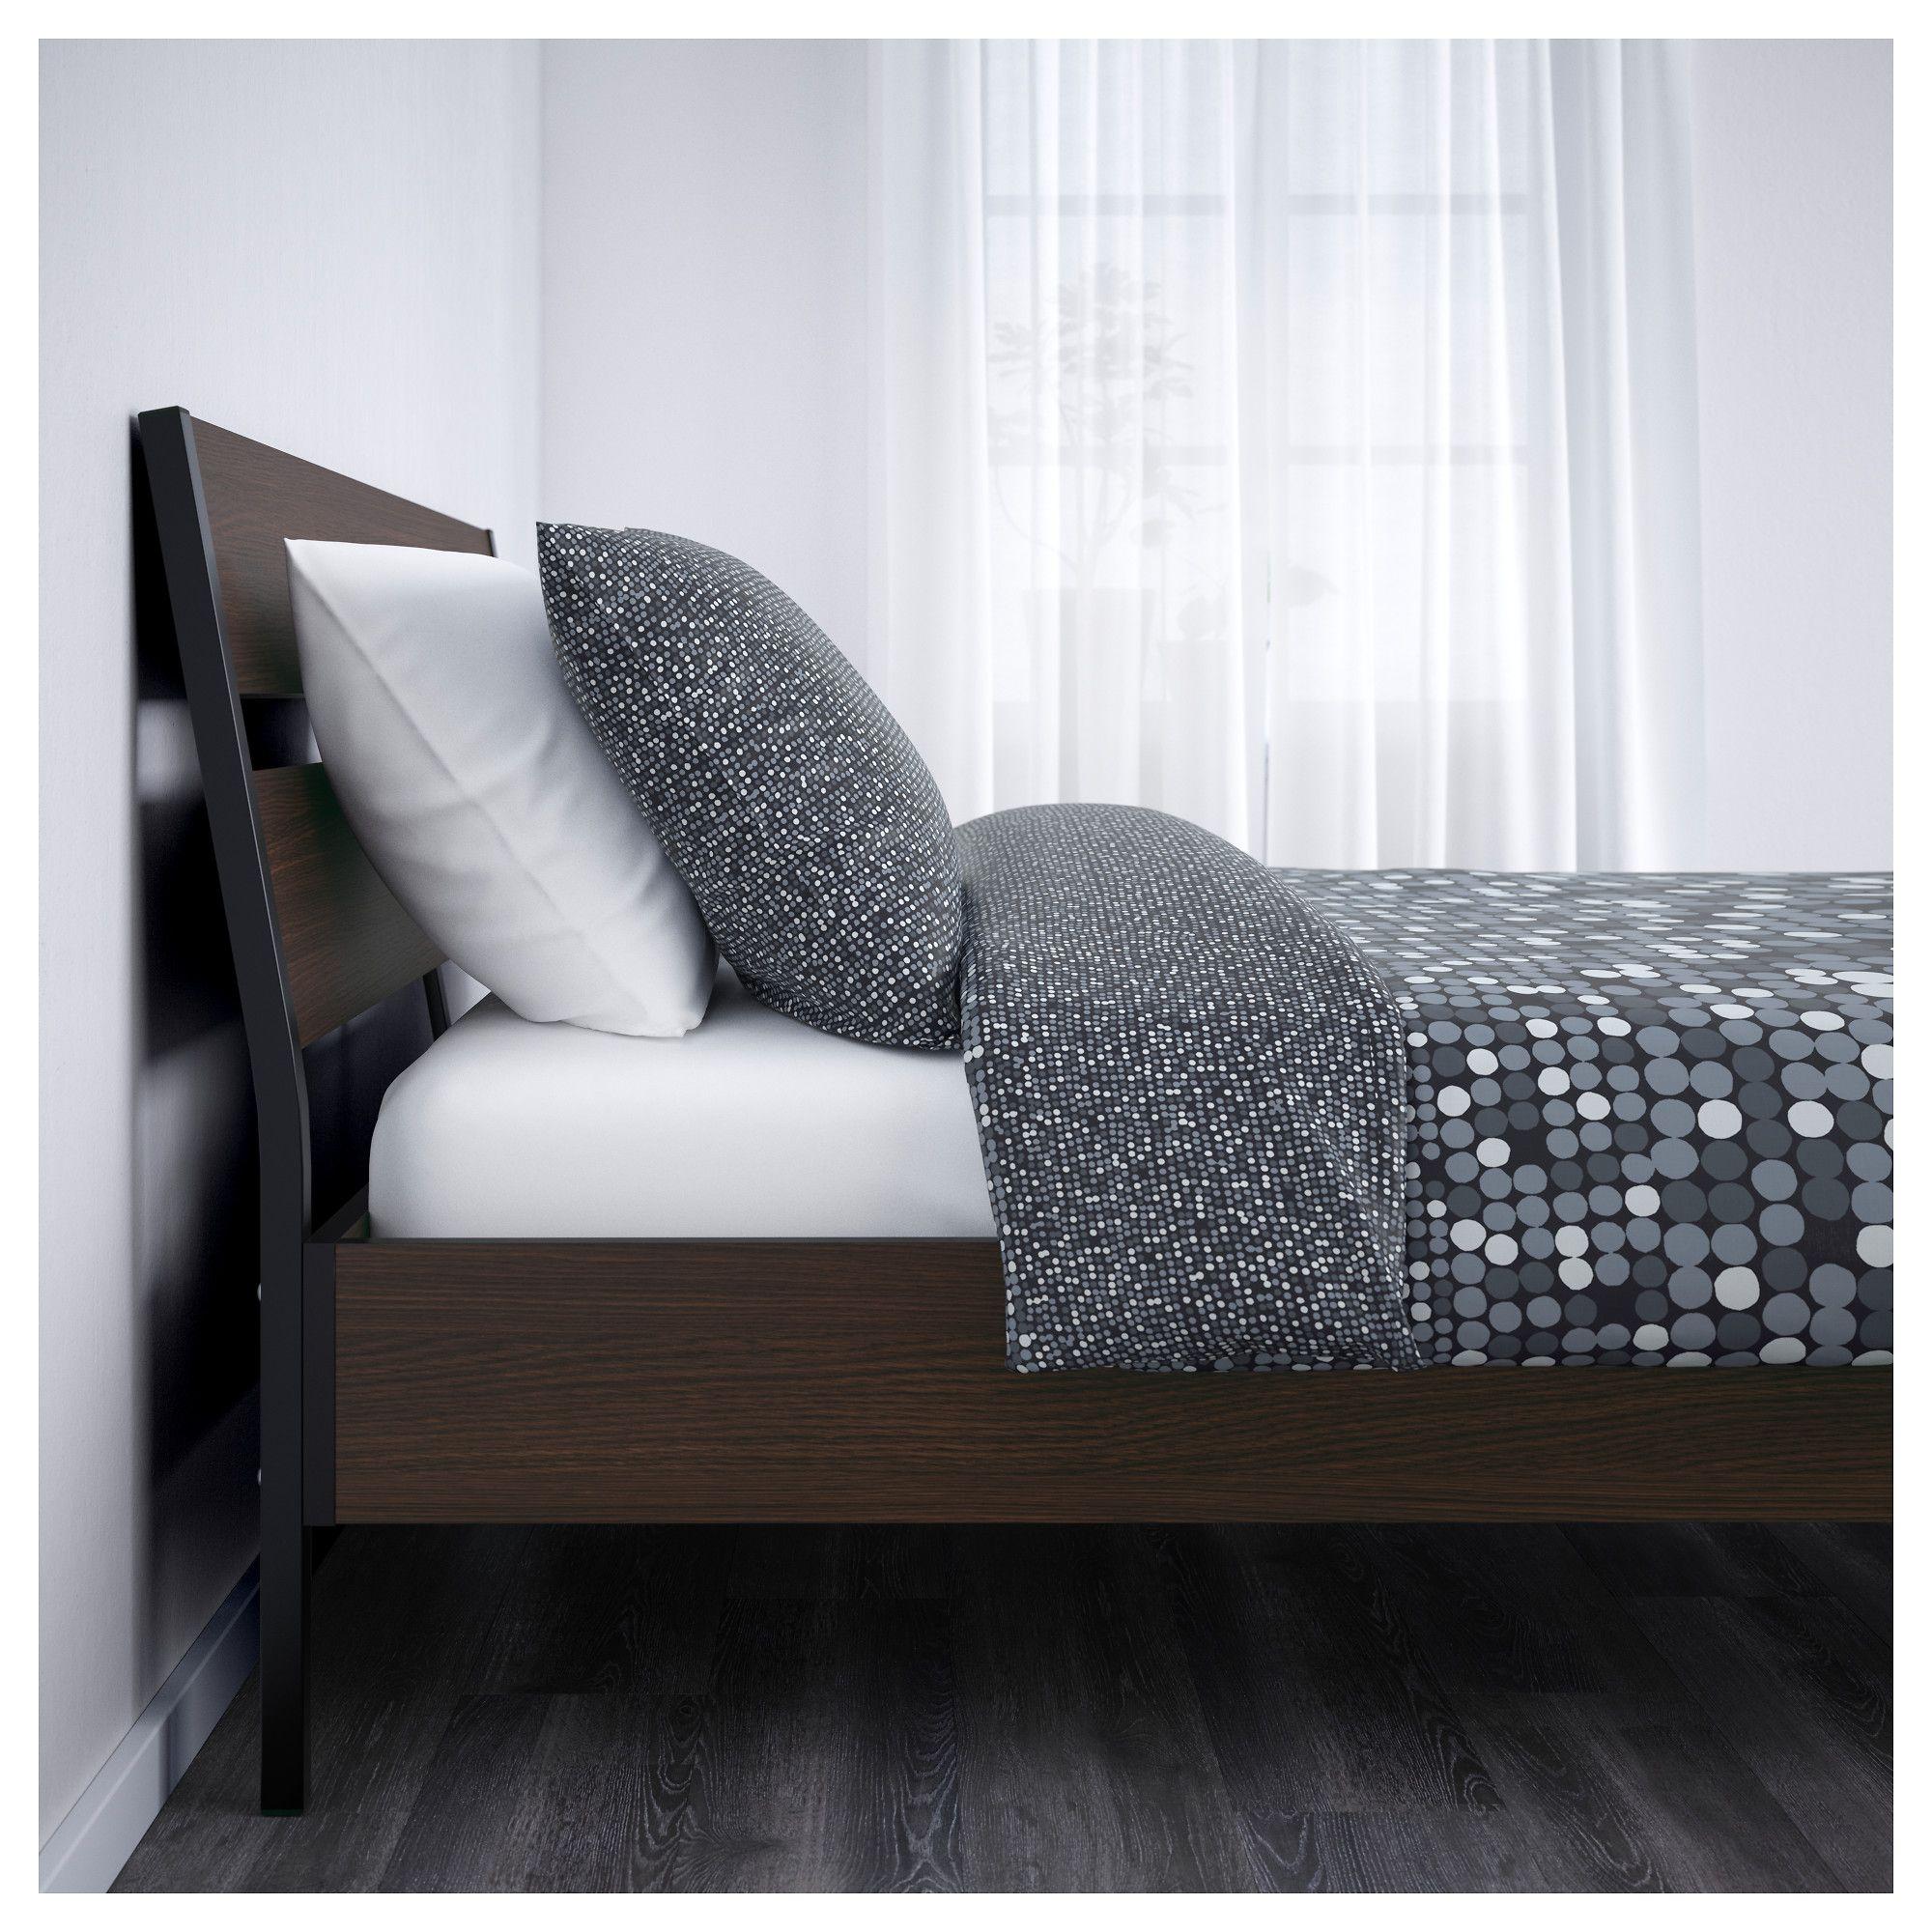 TRYSIL Bed frame, dark brown, Luröy